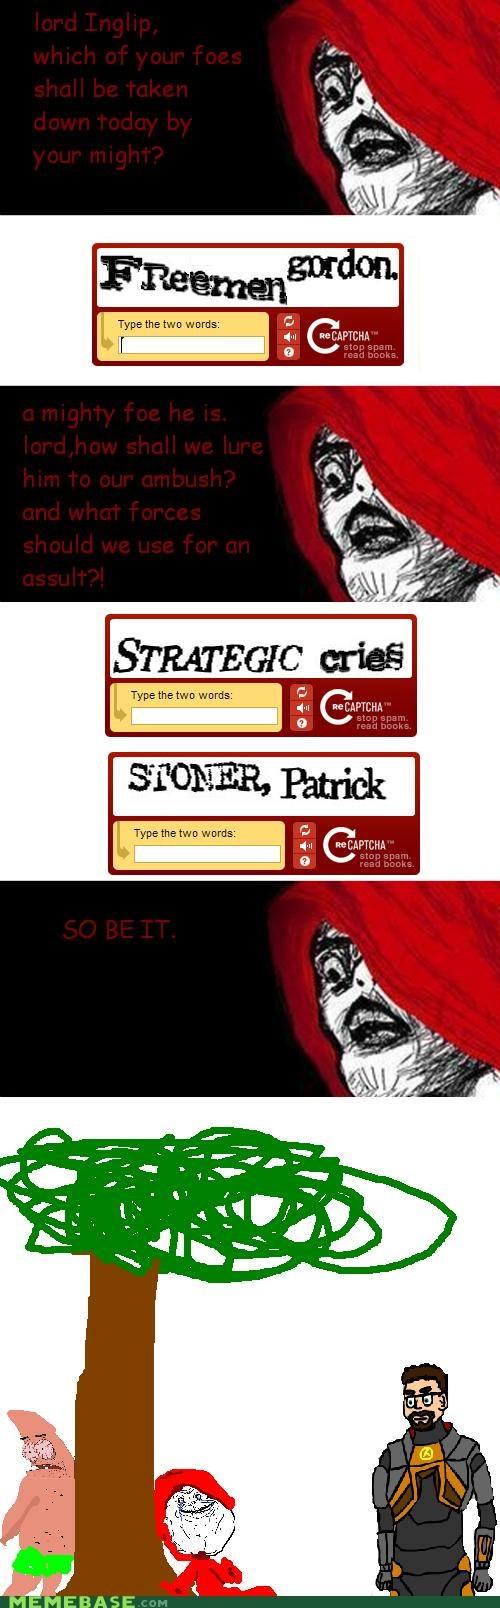 comics consequences gordon freeman half life inglip patrick stoner - 4867782912